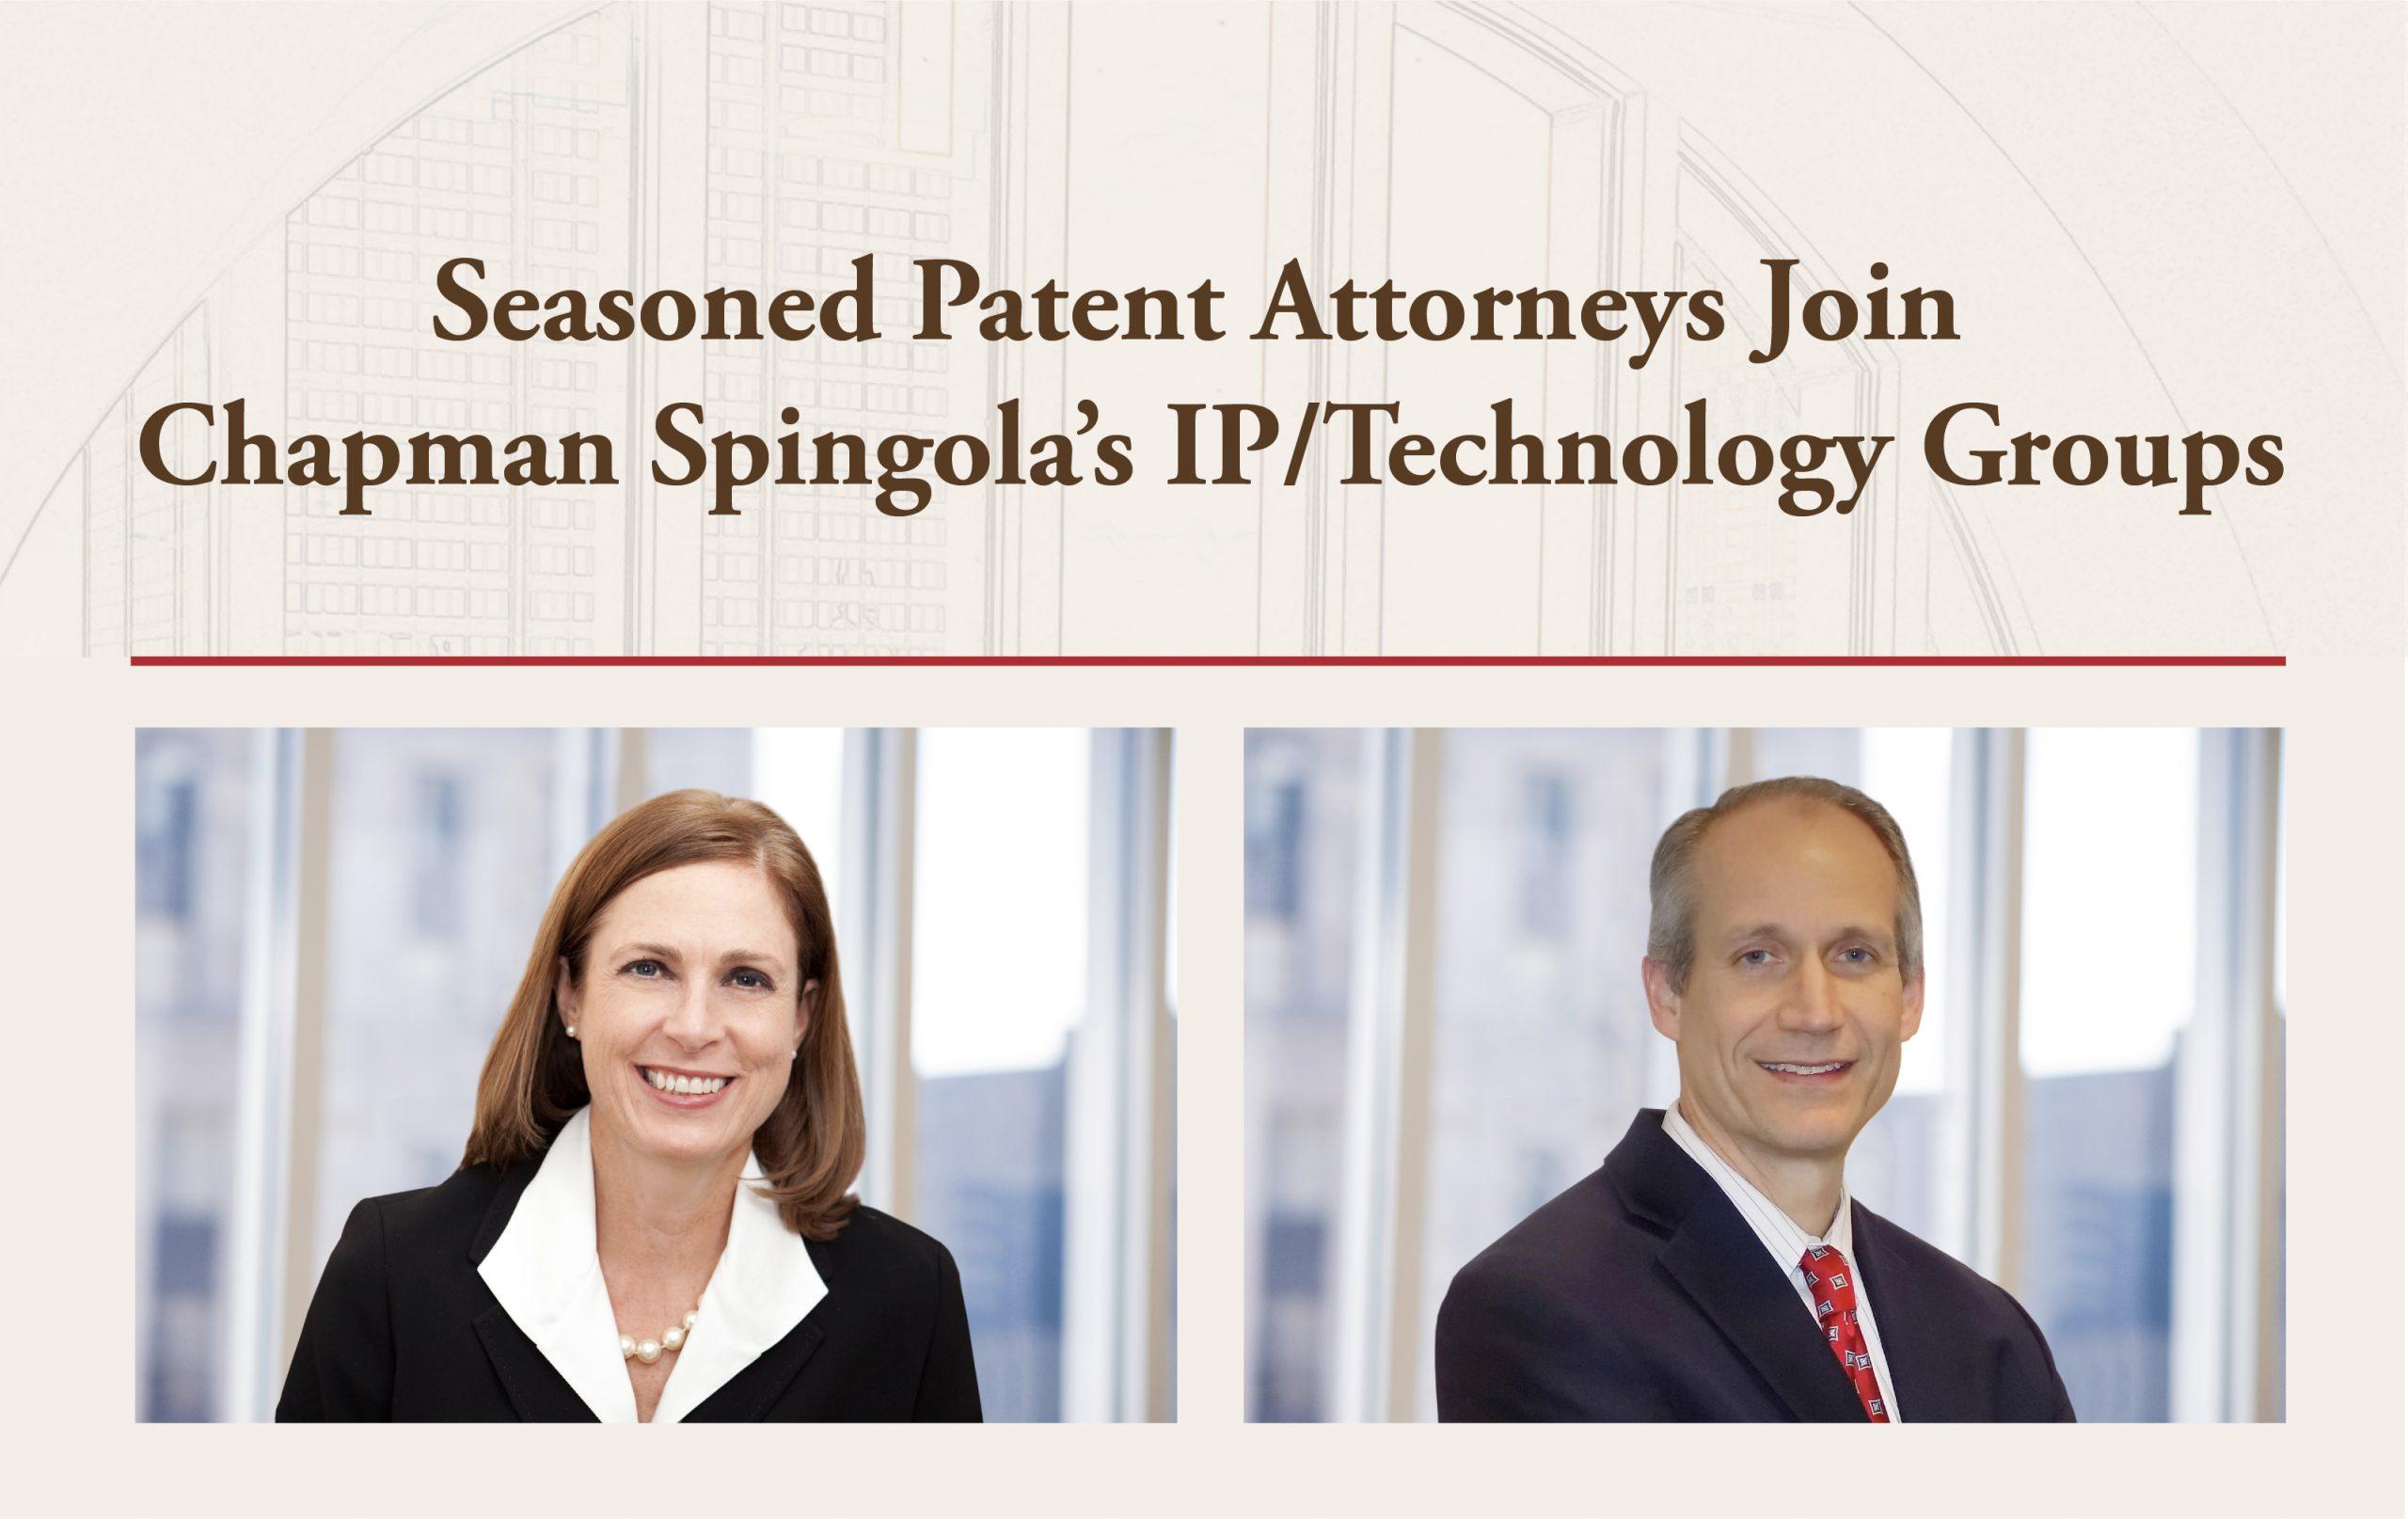 Seasoned Patent Attorneys Join Chapman Spingola